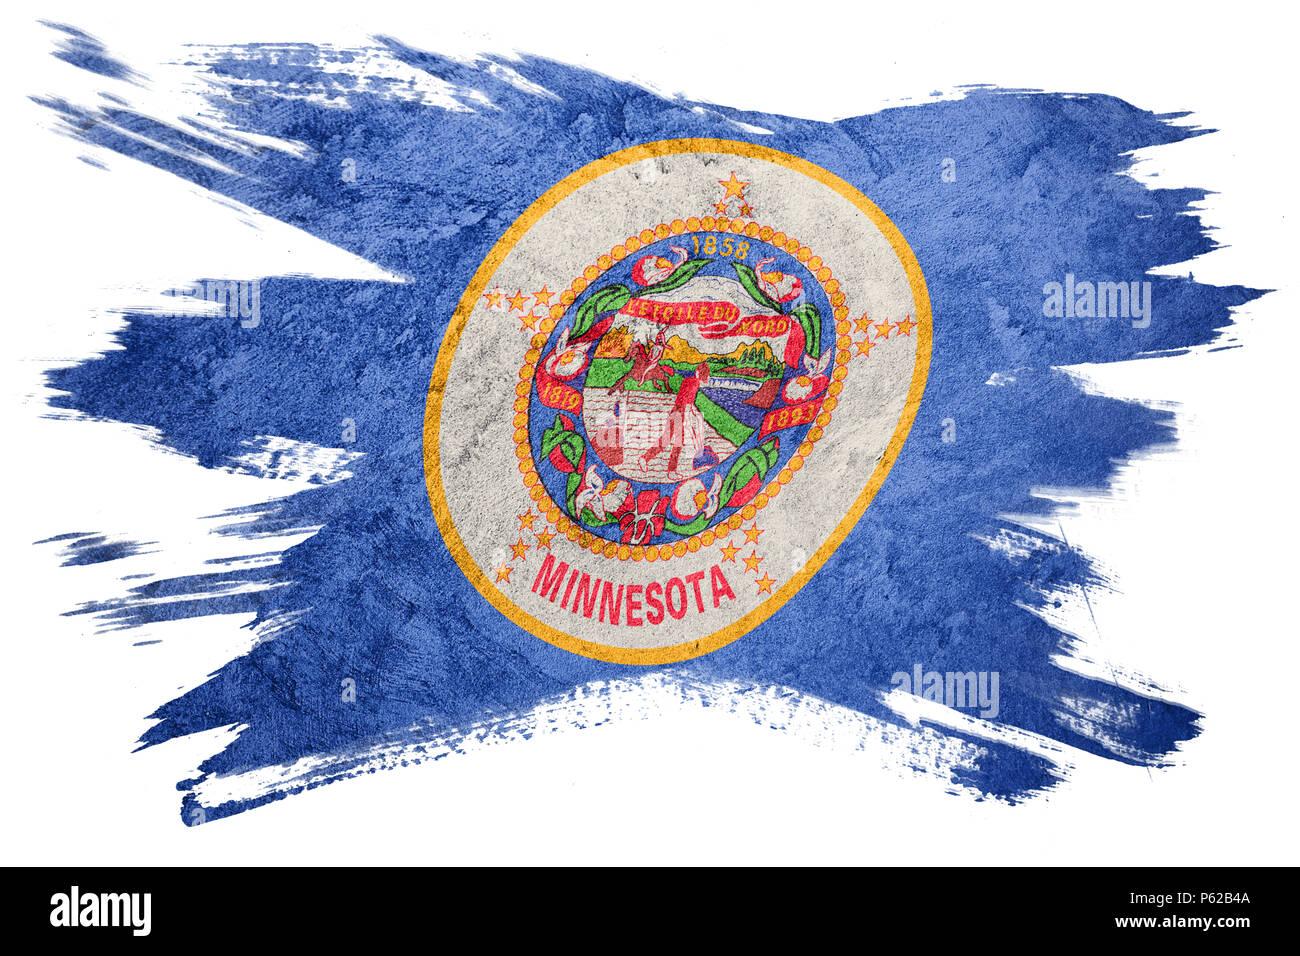 Grunge Minnesota State Flag Minnesota Flag Brush Stroke Stock Photo